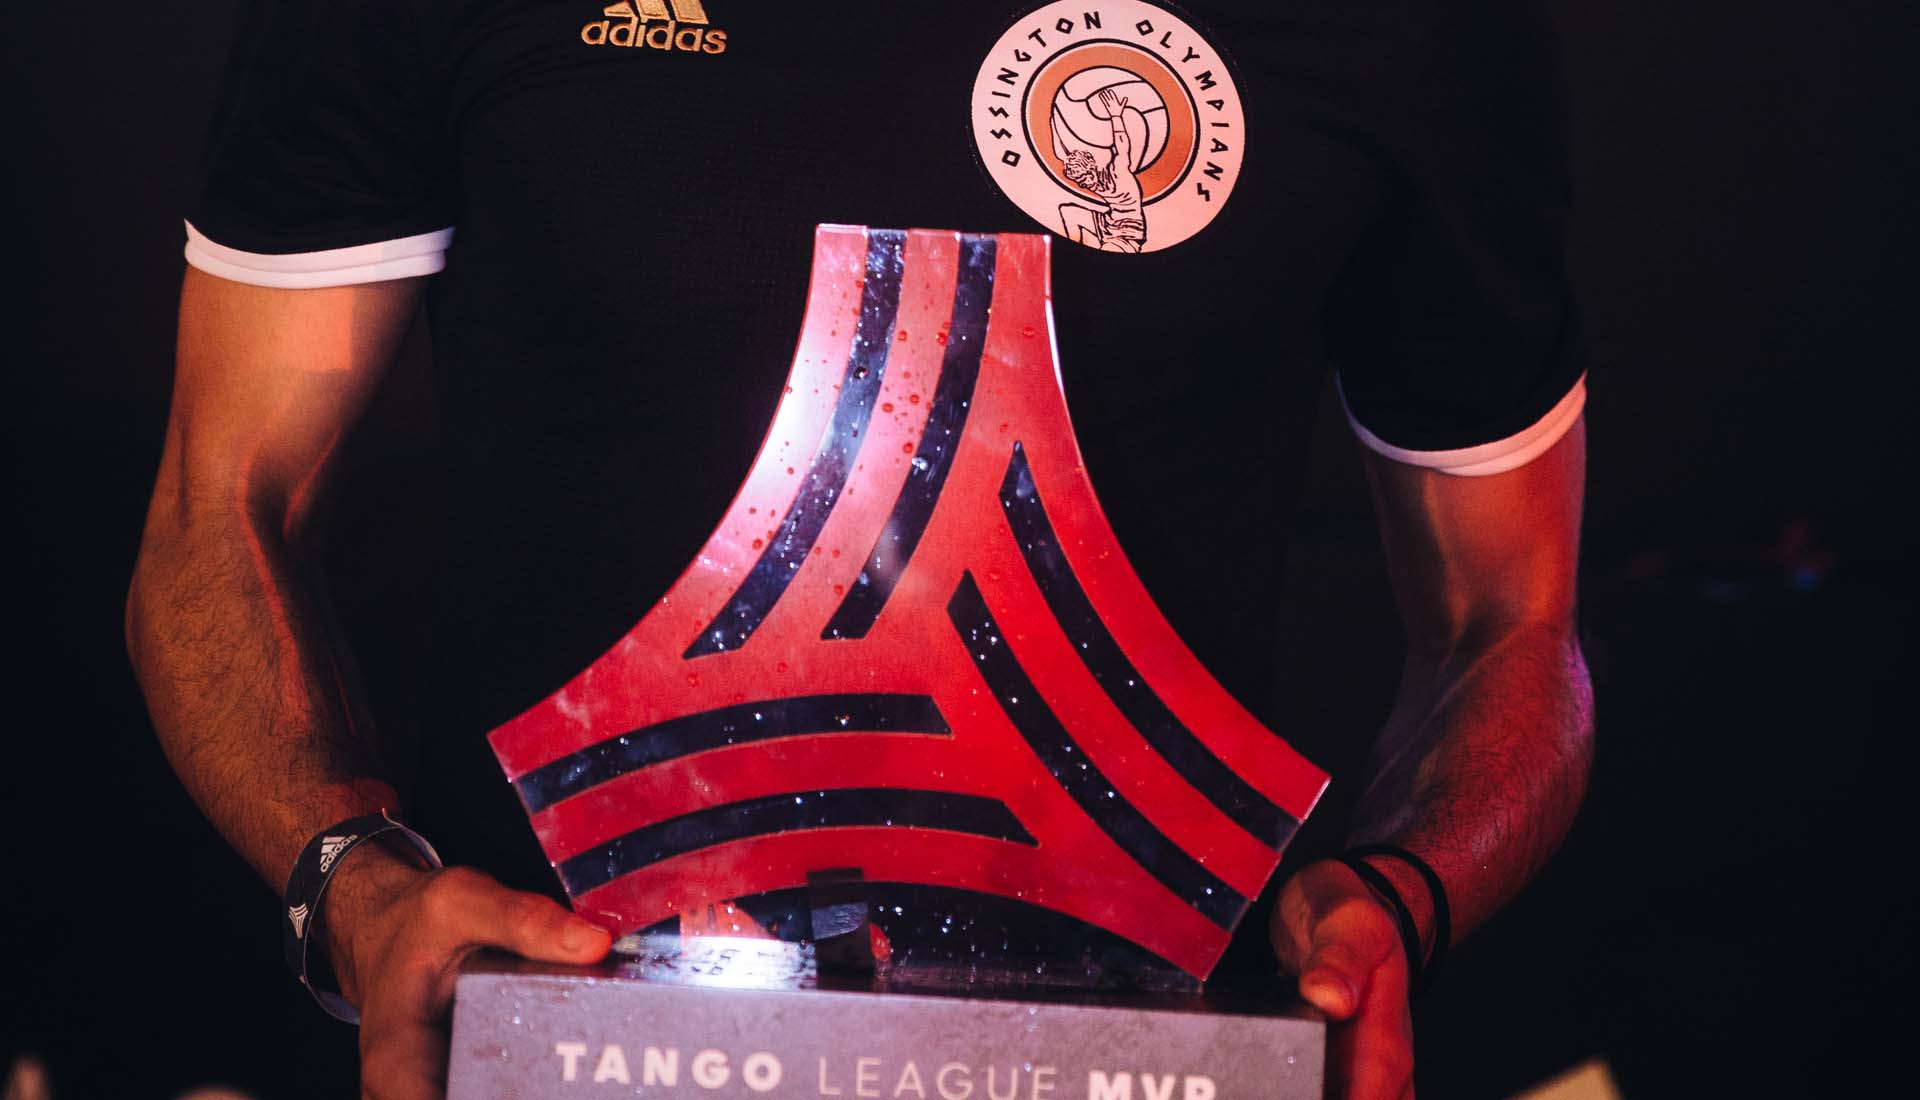 Tango League Toronto Brings Next Level Custom Finish